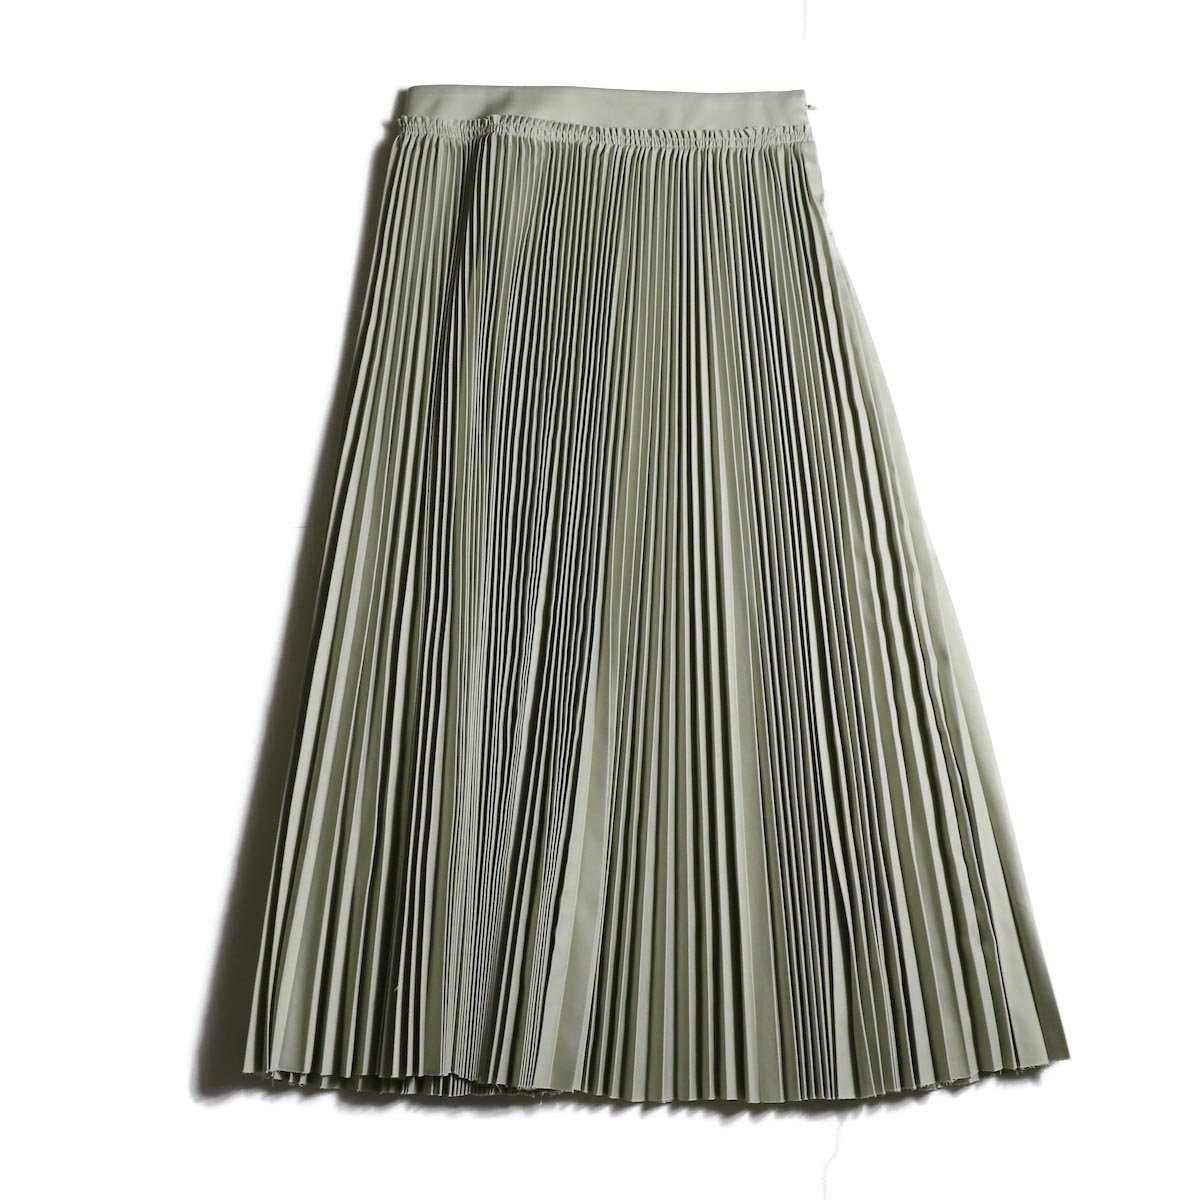 YLEVE / Chino Pleats Skirt (Sage)